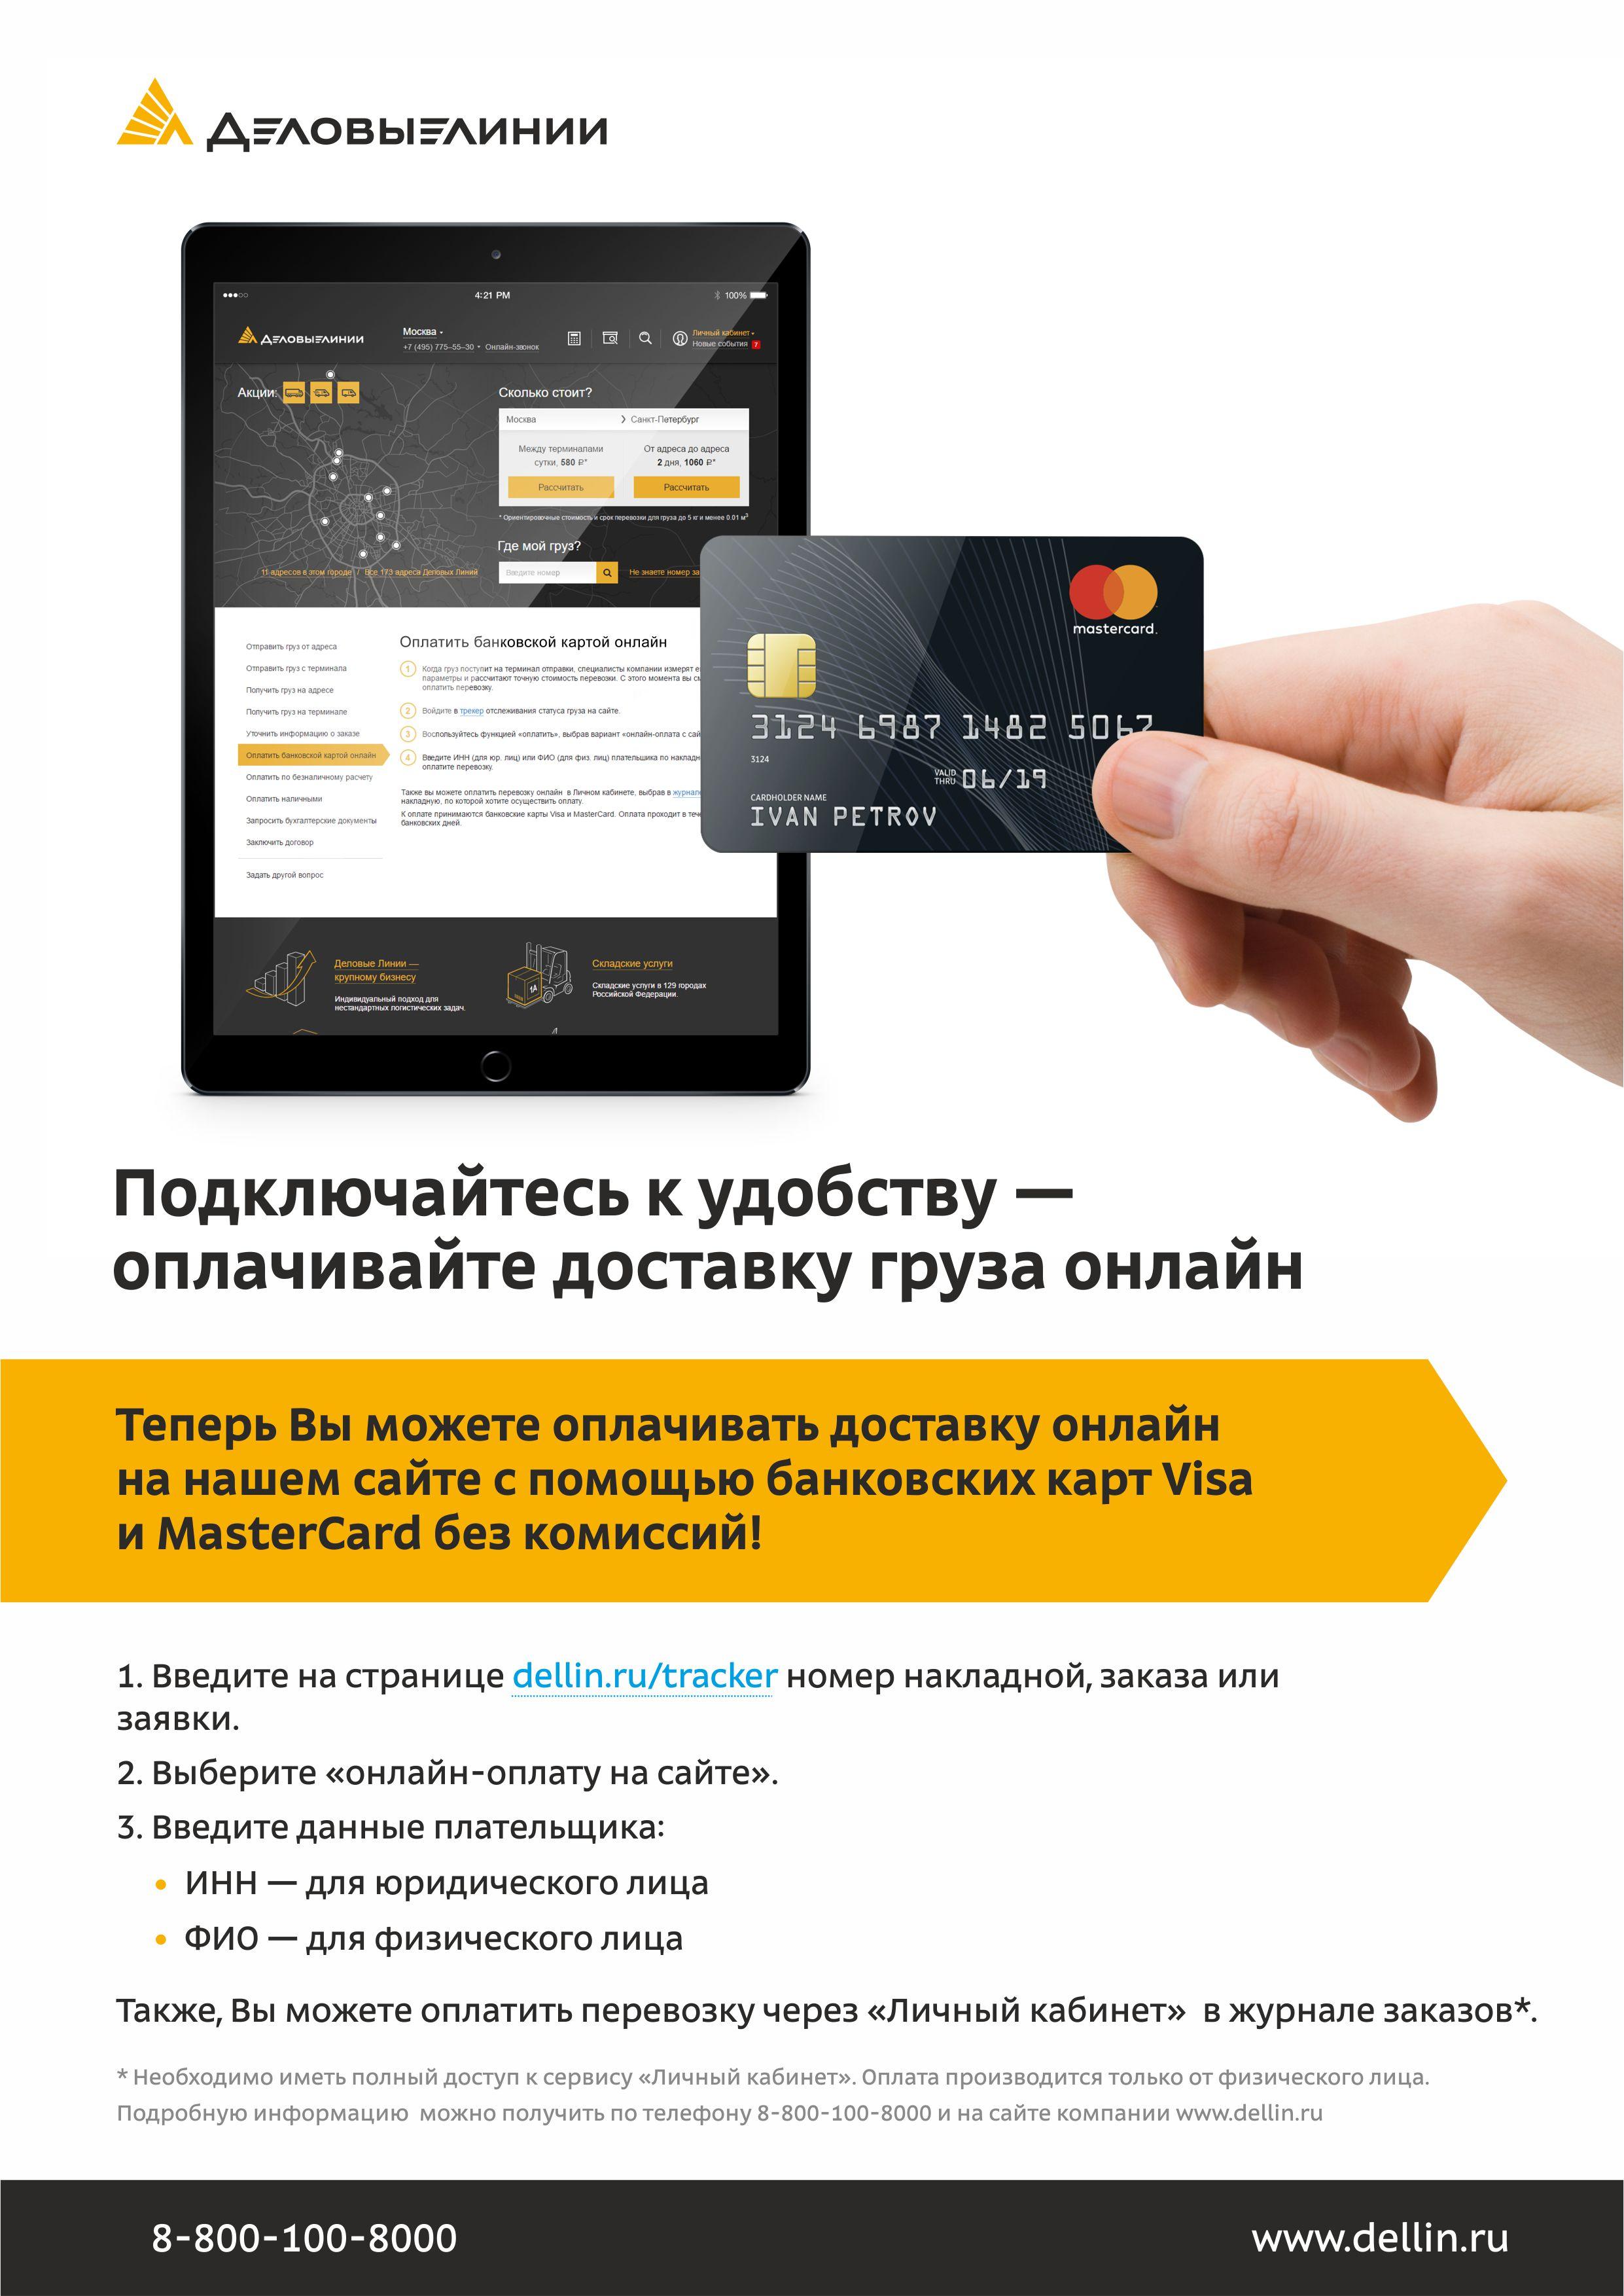 Листовка Деловые Линии «Оплата доставки груза онлайн»